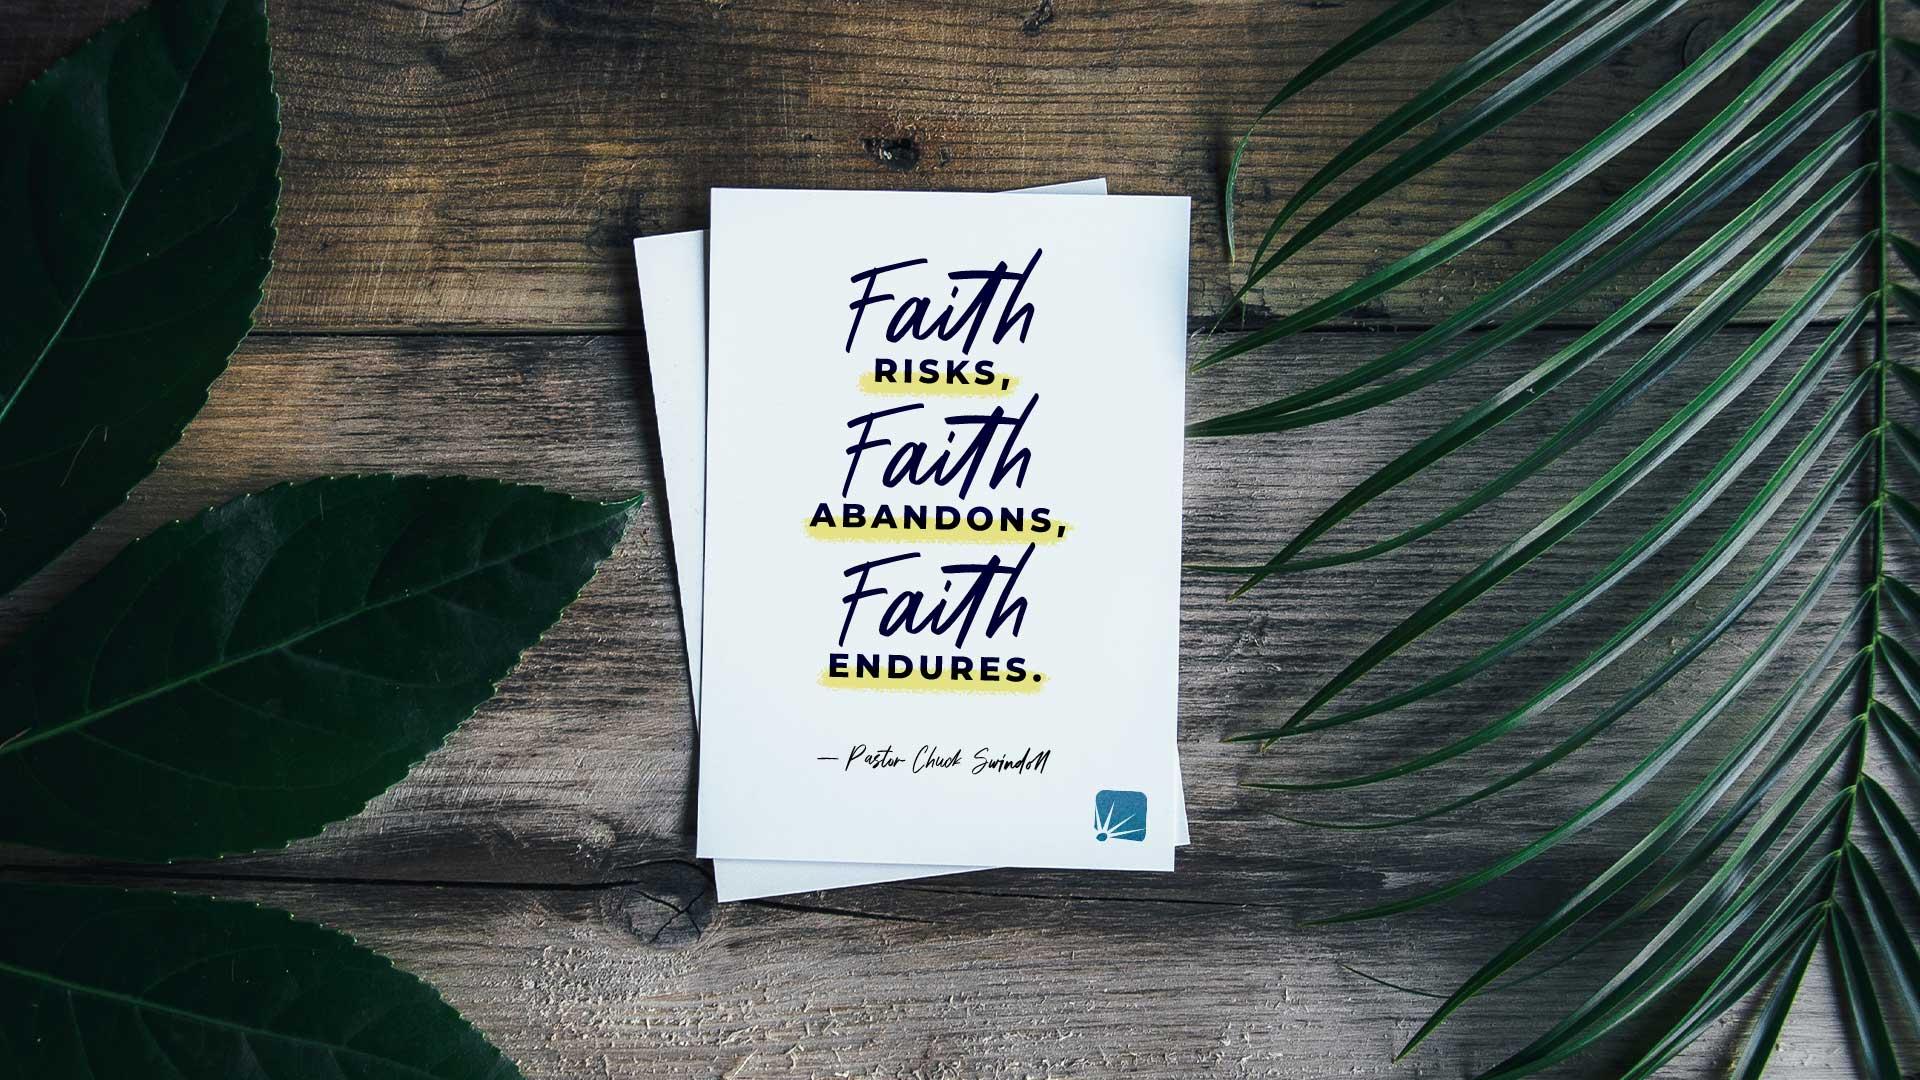 Riesgos de fe. La fe abandona. La fe perdura.